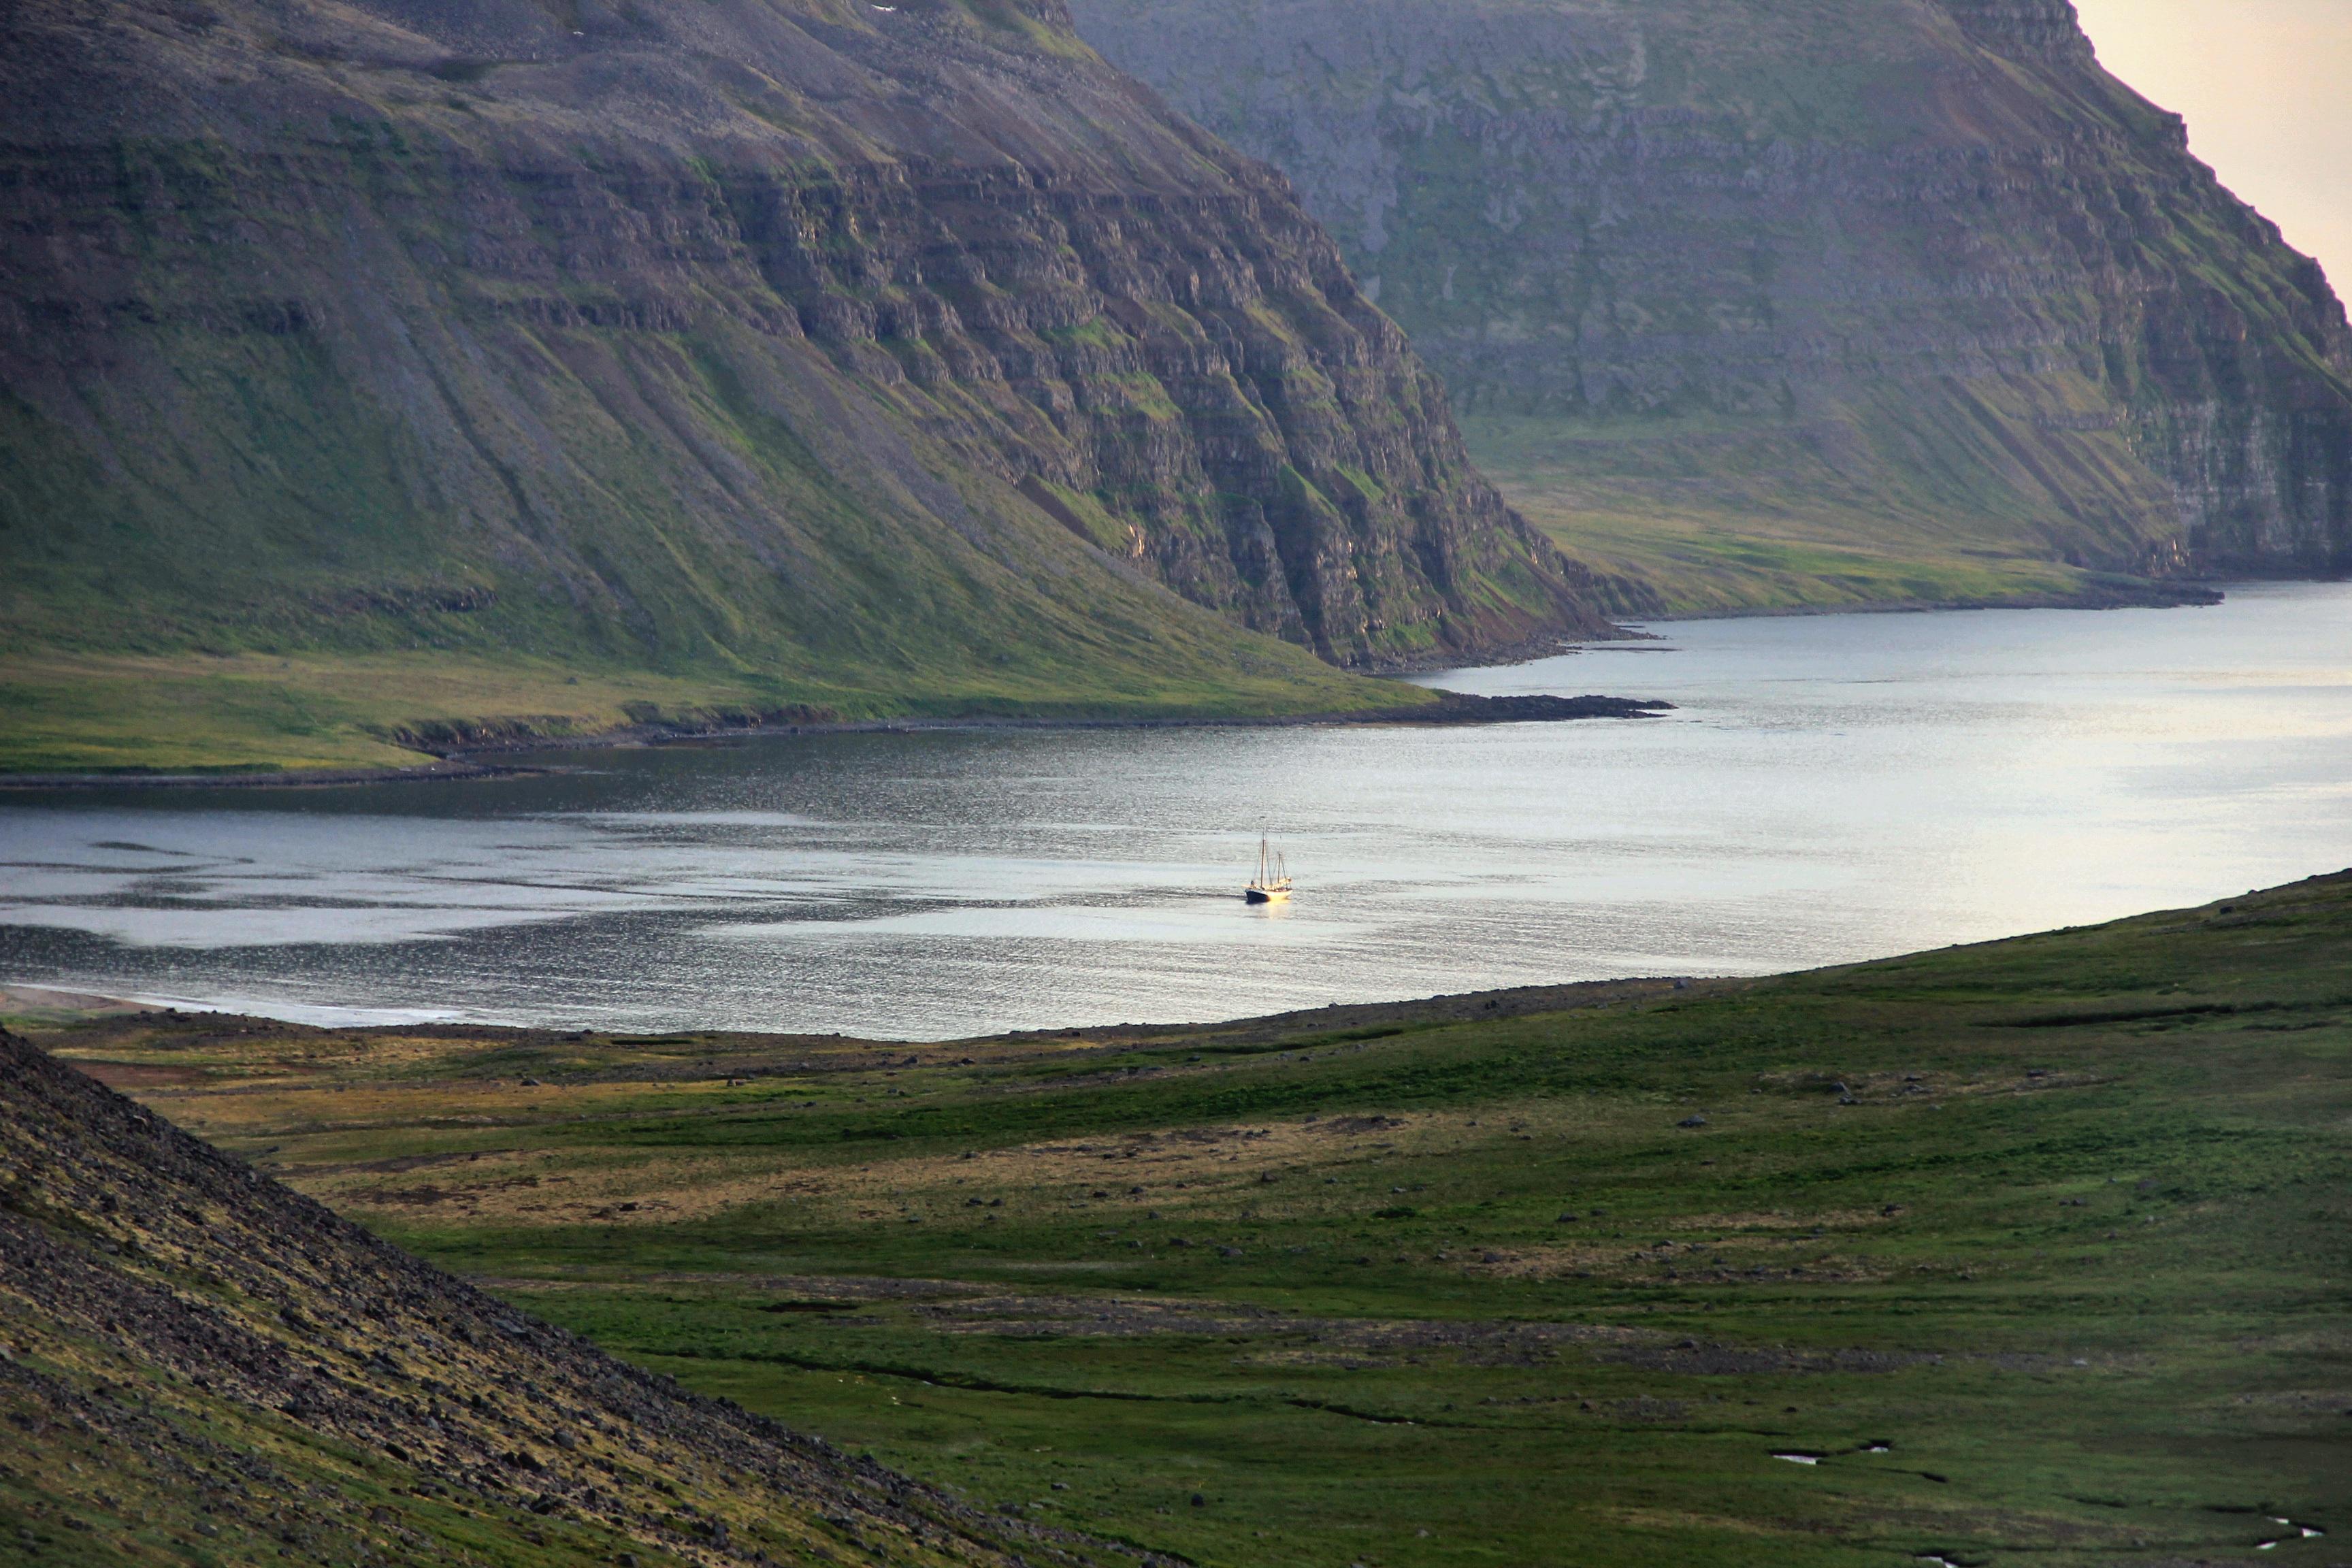 Tecla anchored in adelvik